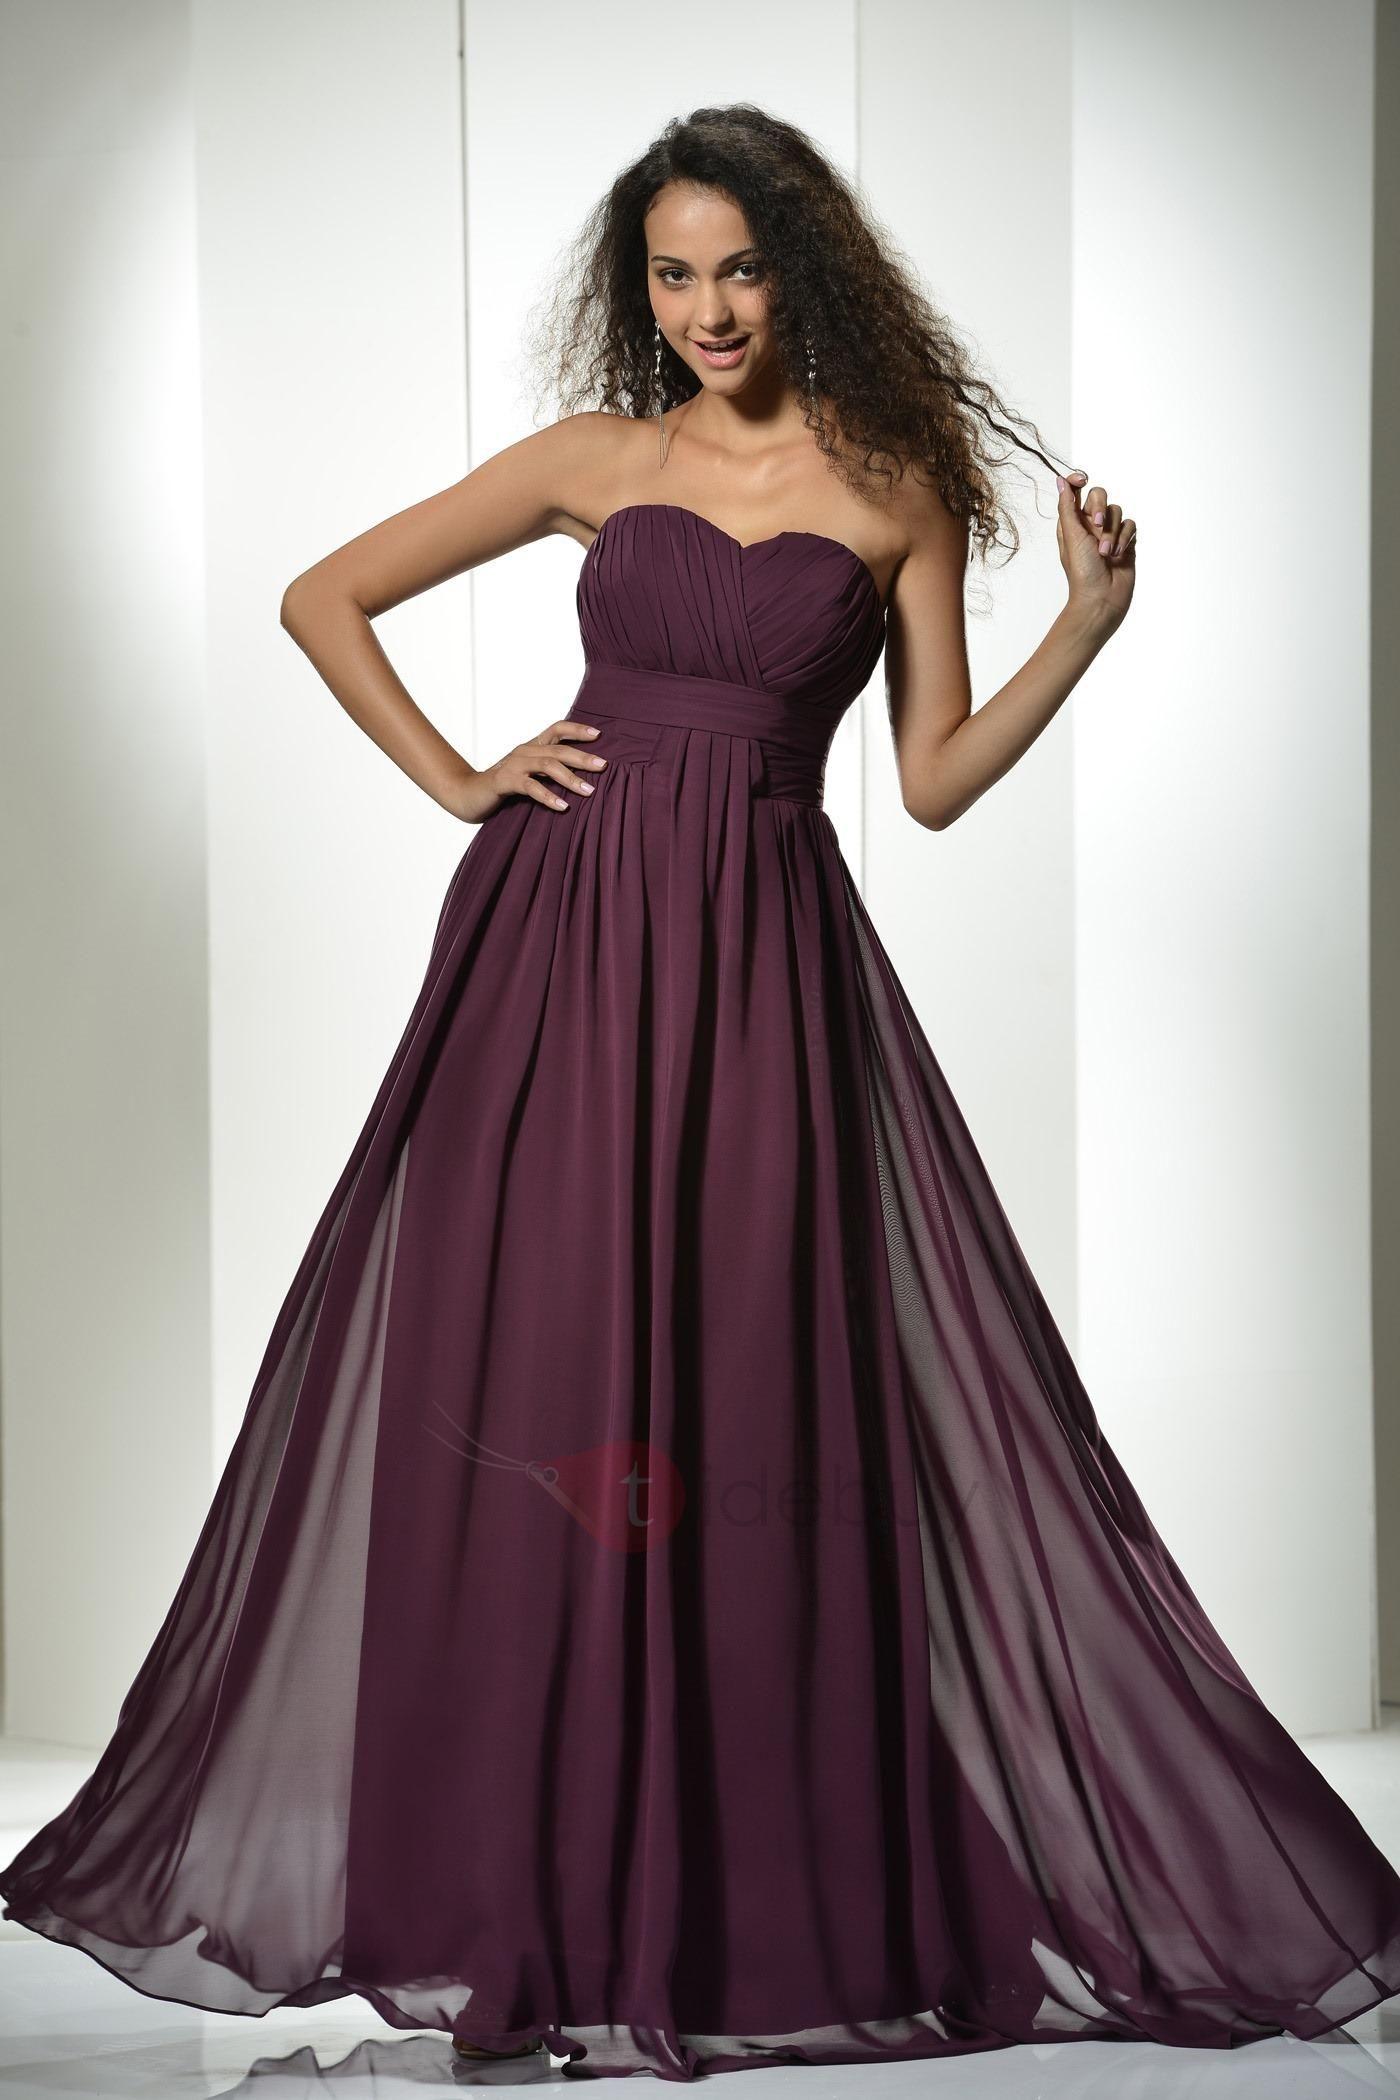 Simple Ruched ALine FloorLength Sweetheart Empire Waist Long Dress